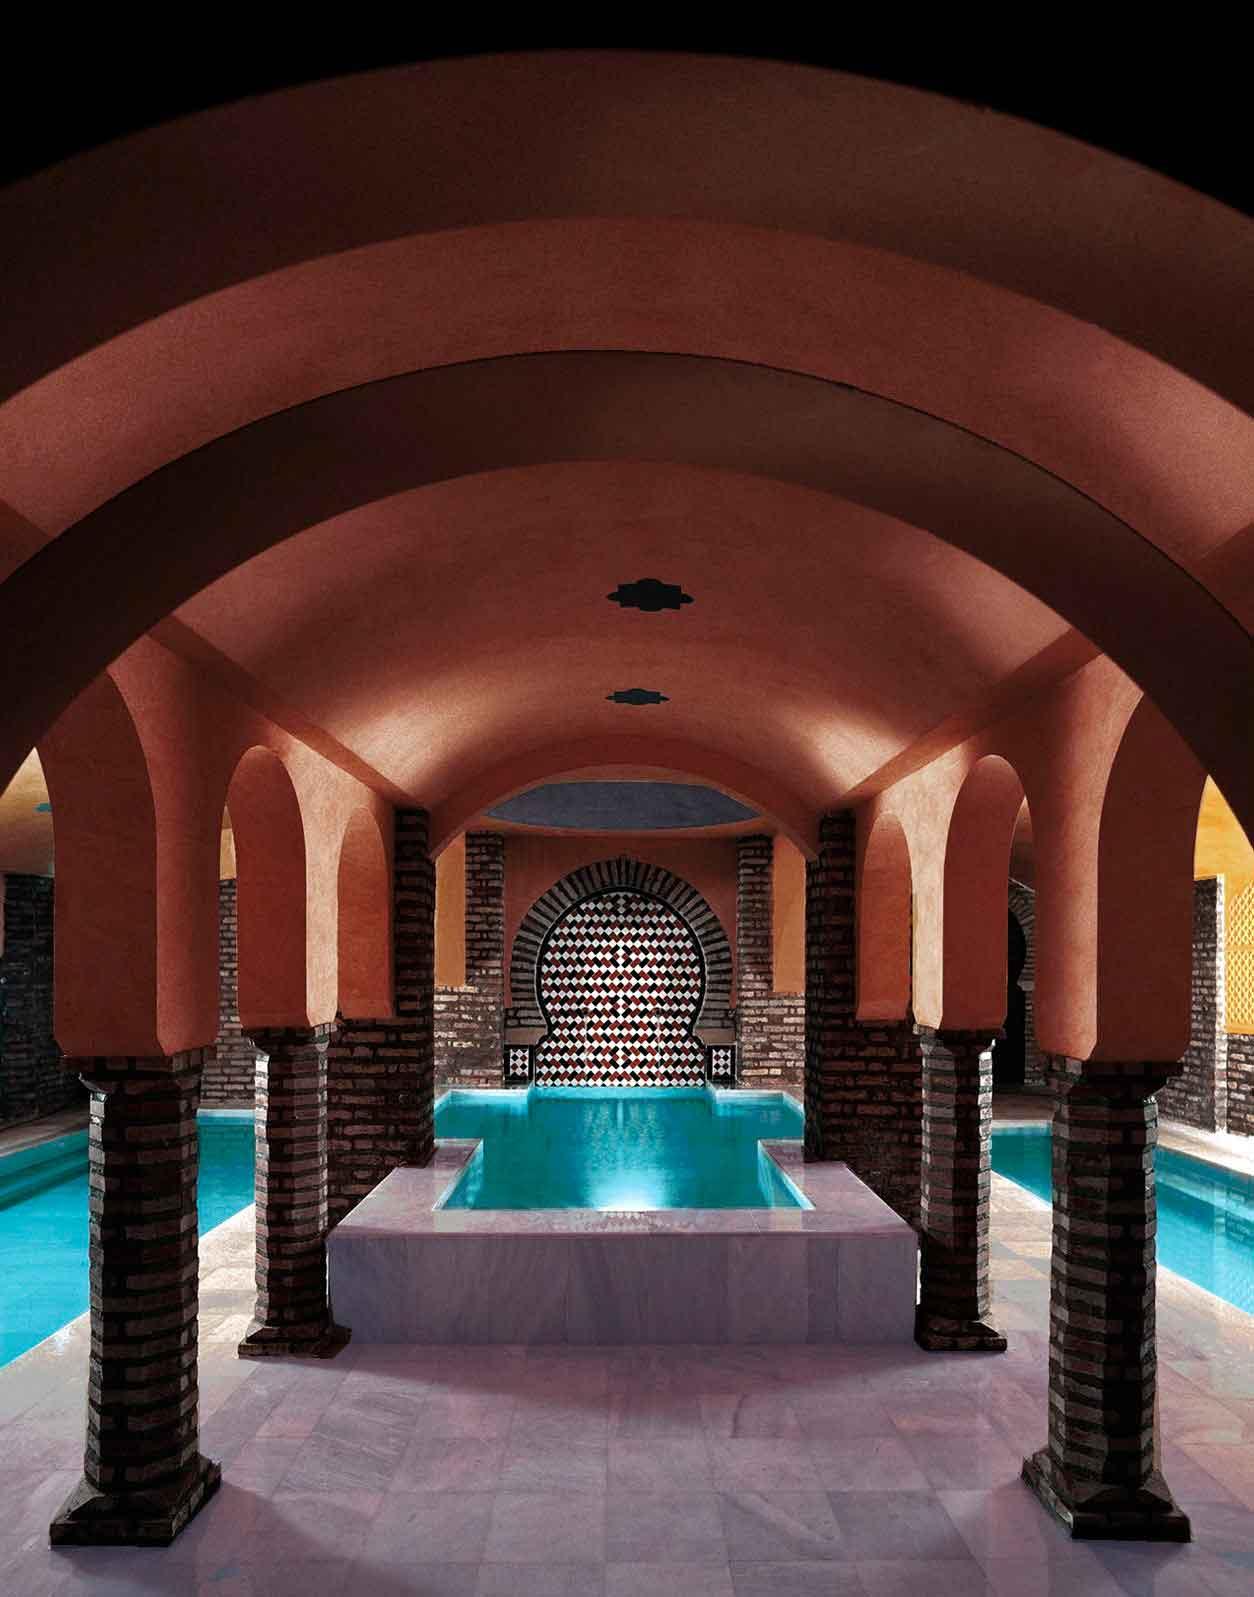 Banos arabes real de la alhambra ba os arabes real - Banos arabes palacio de comares ...